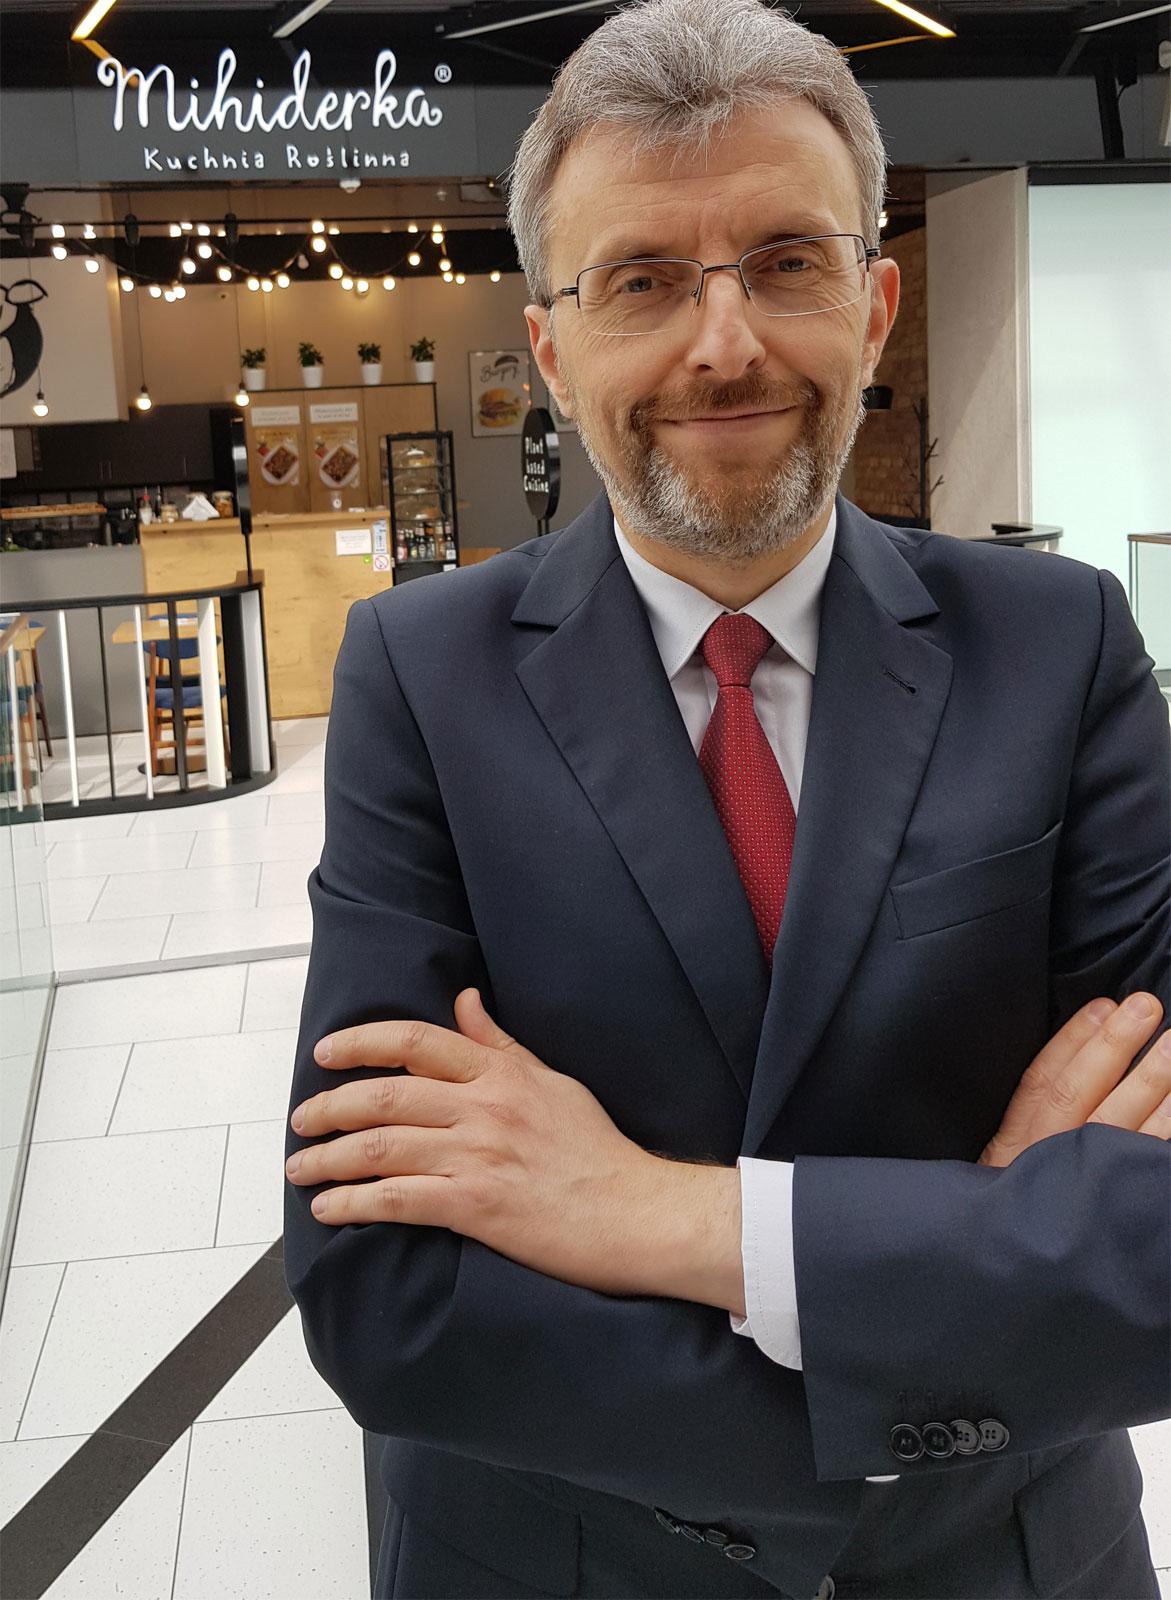 Marcin Krysiński, franczyzodawca Mihiderki